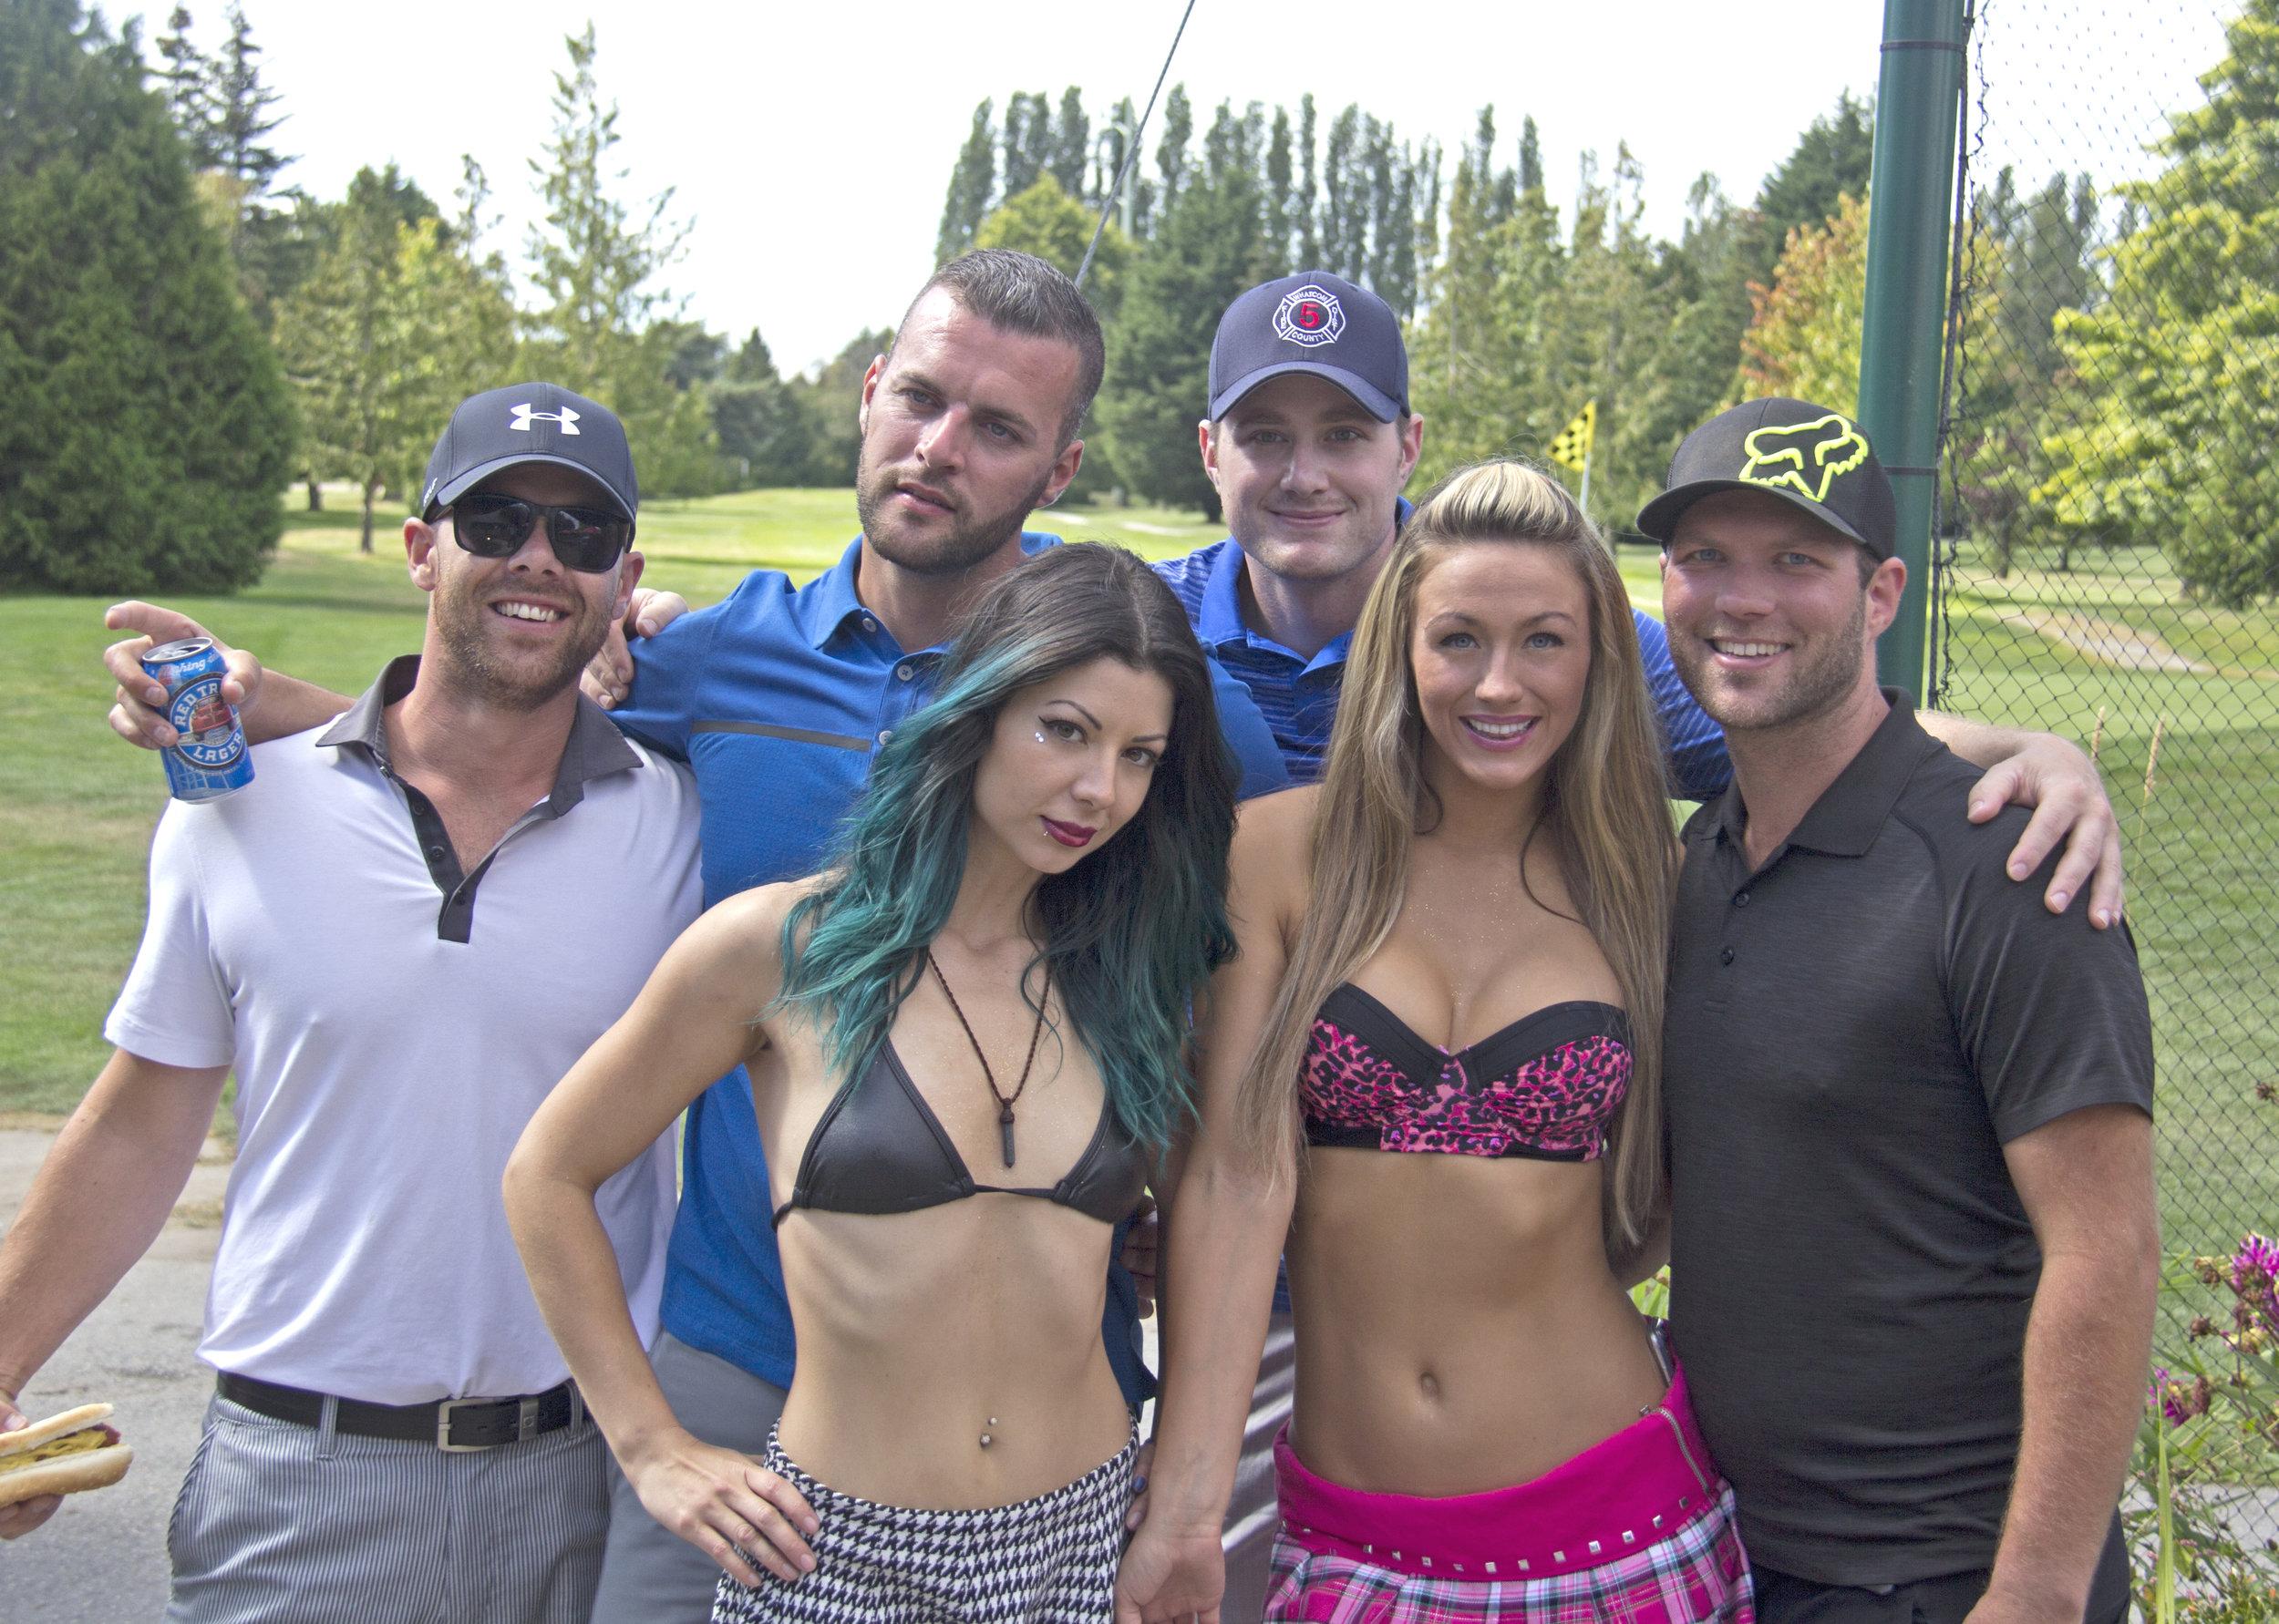 golf_caddies_babes.jpg